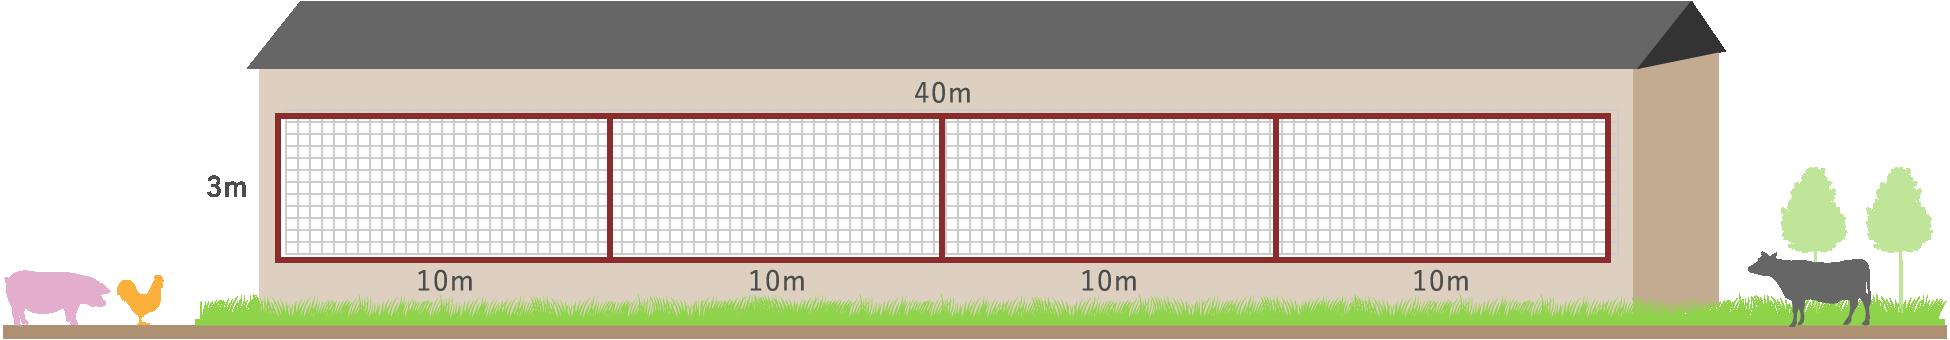 ex.高さ3m横幅40m(柱間隔10m)の開口部の場合